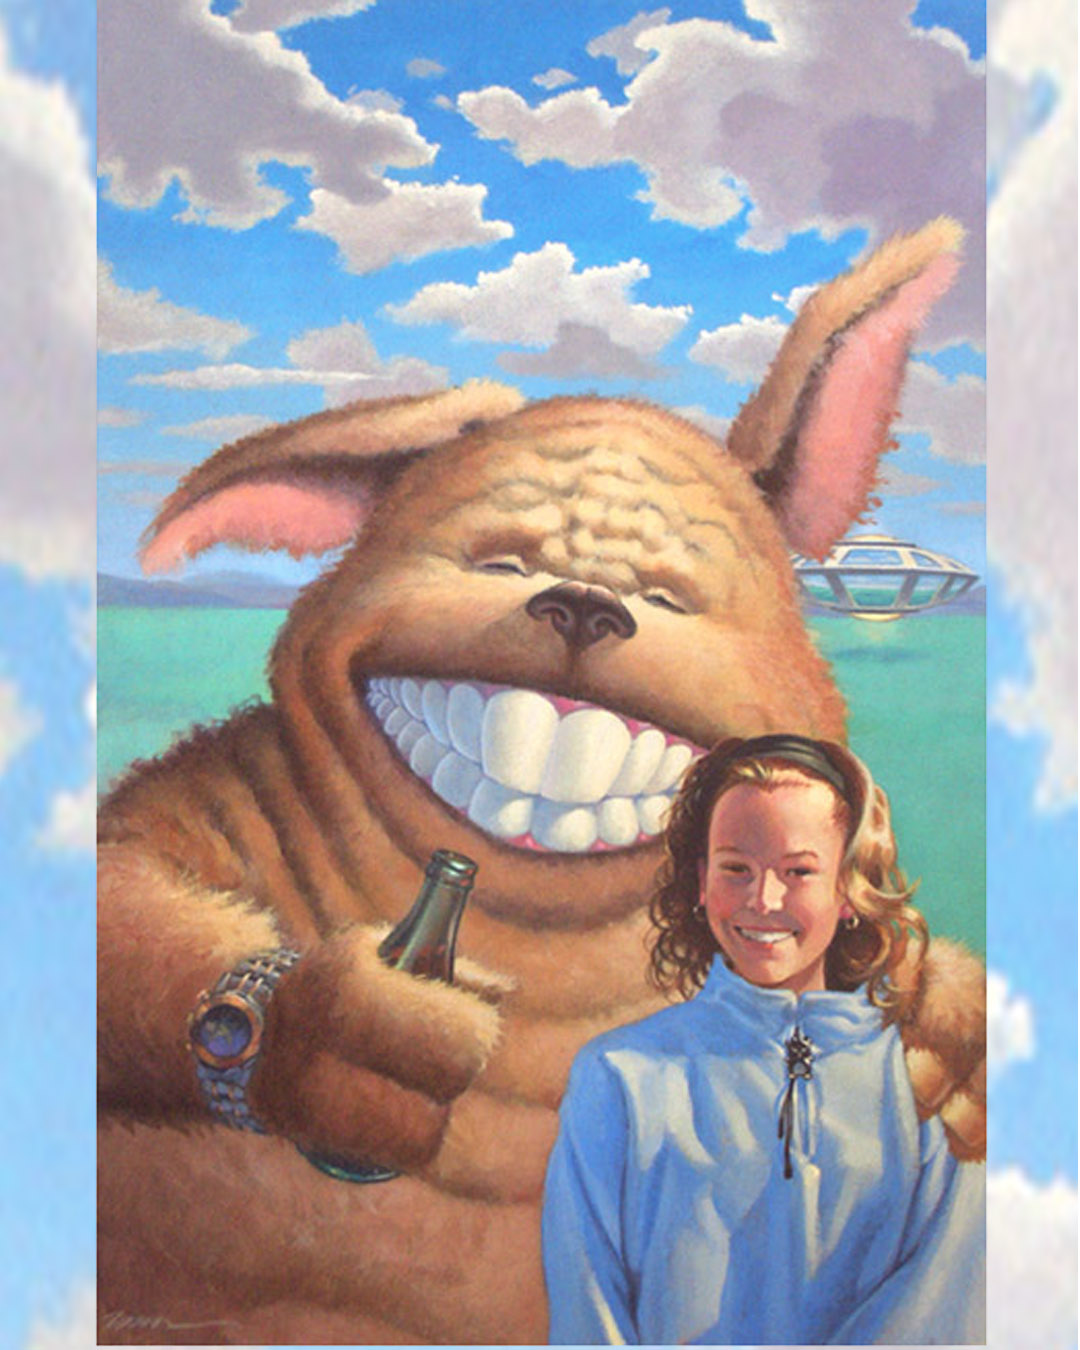 kind of a bunny